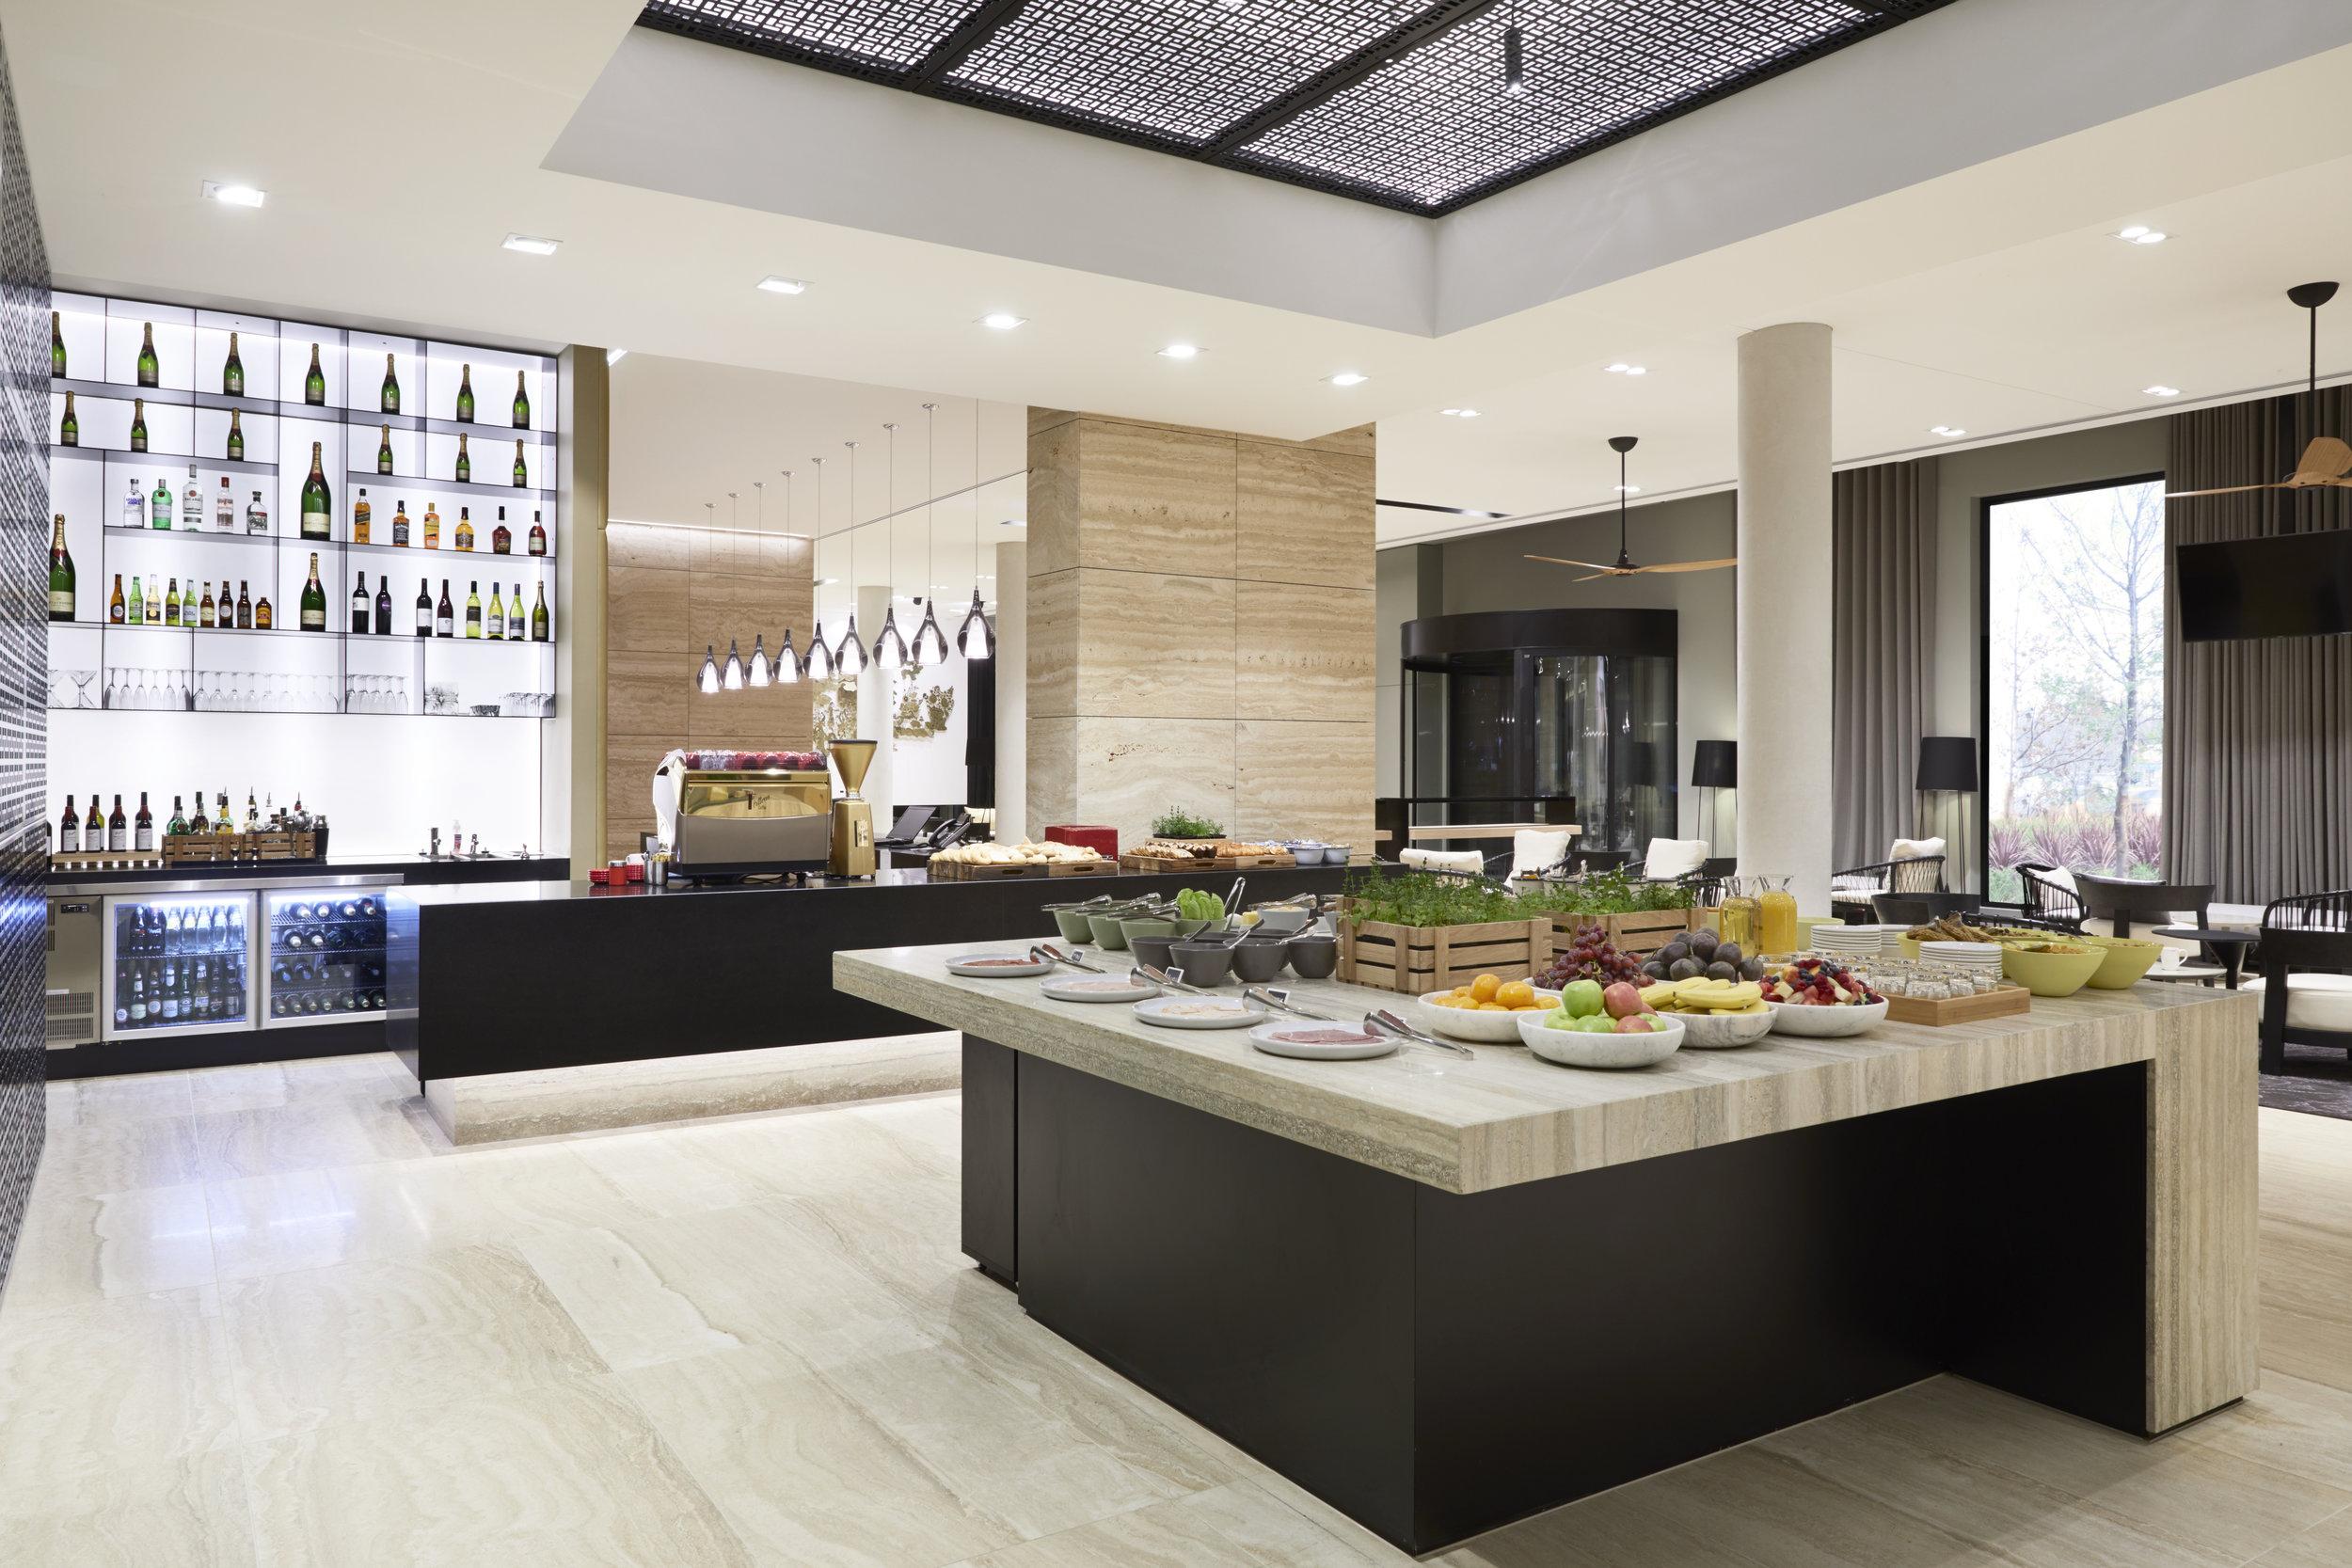 Hyatt Place Melbourne Essendon Fields Lobby